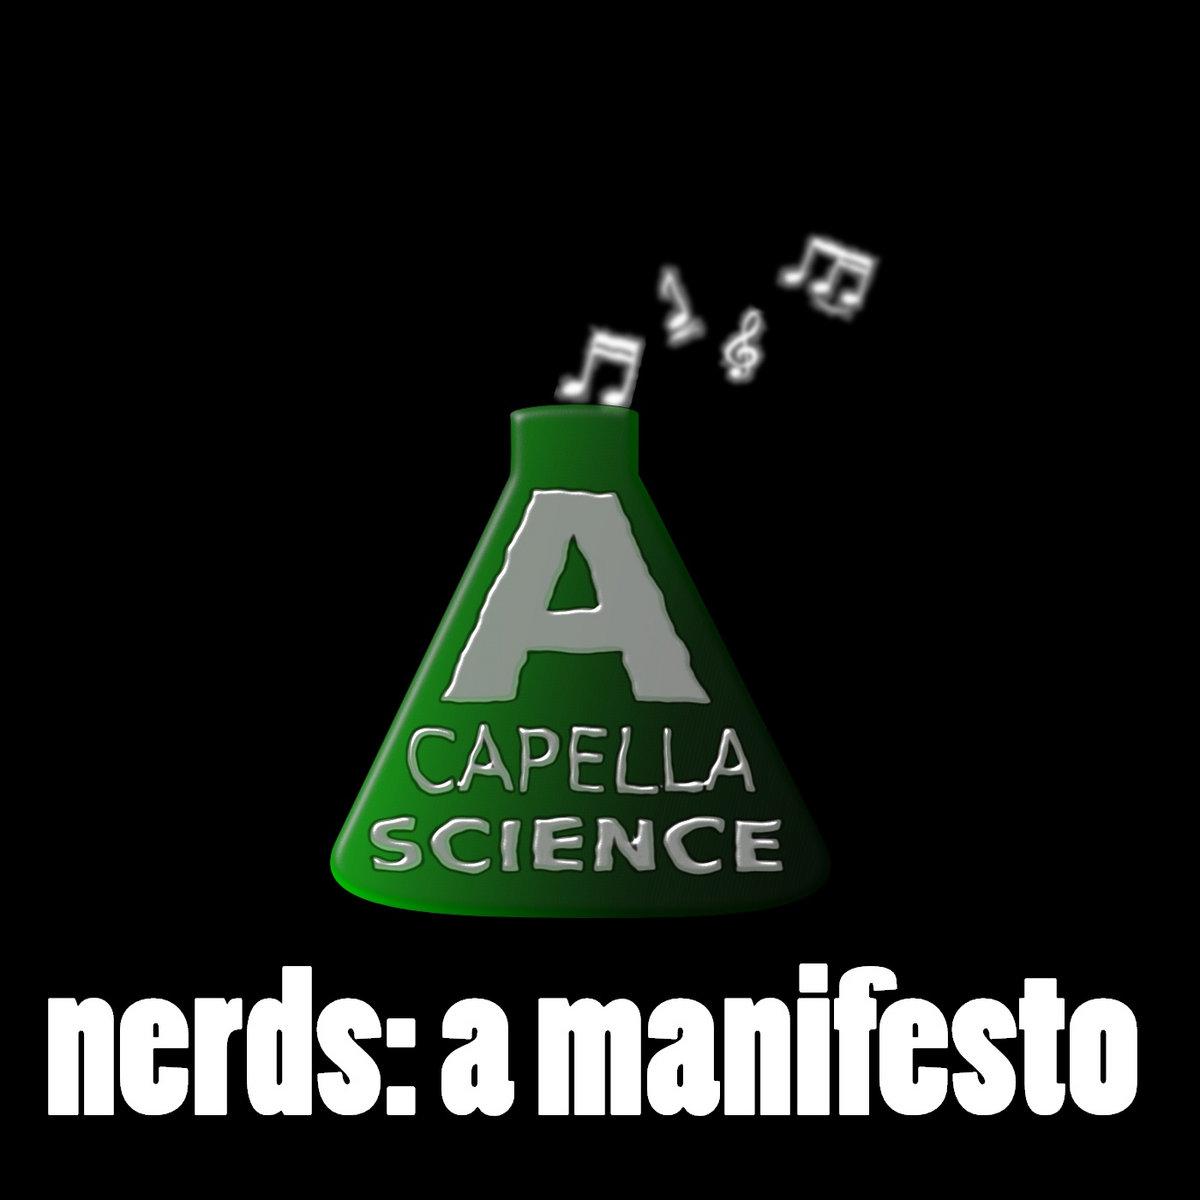 nerd vs geek lyrics